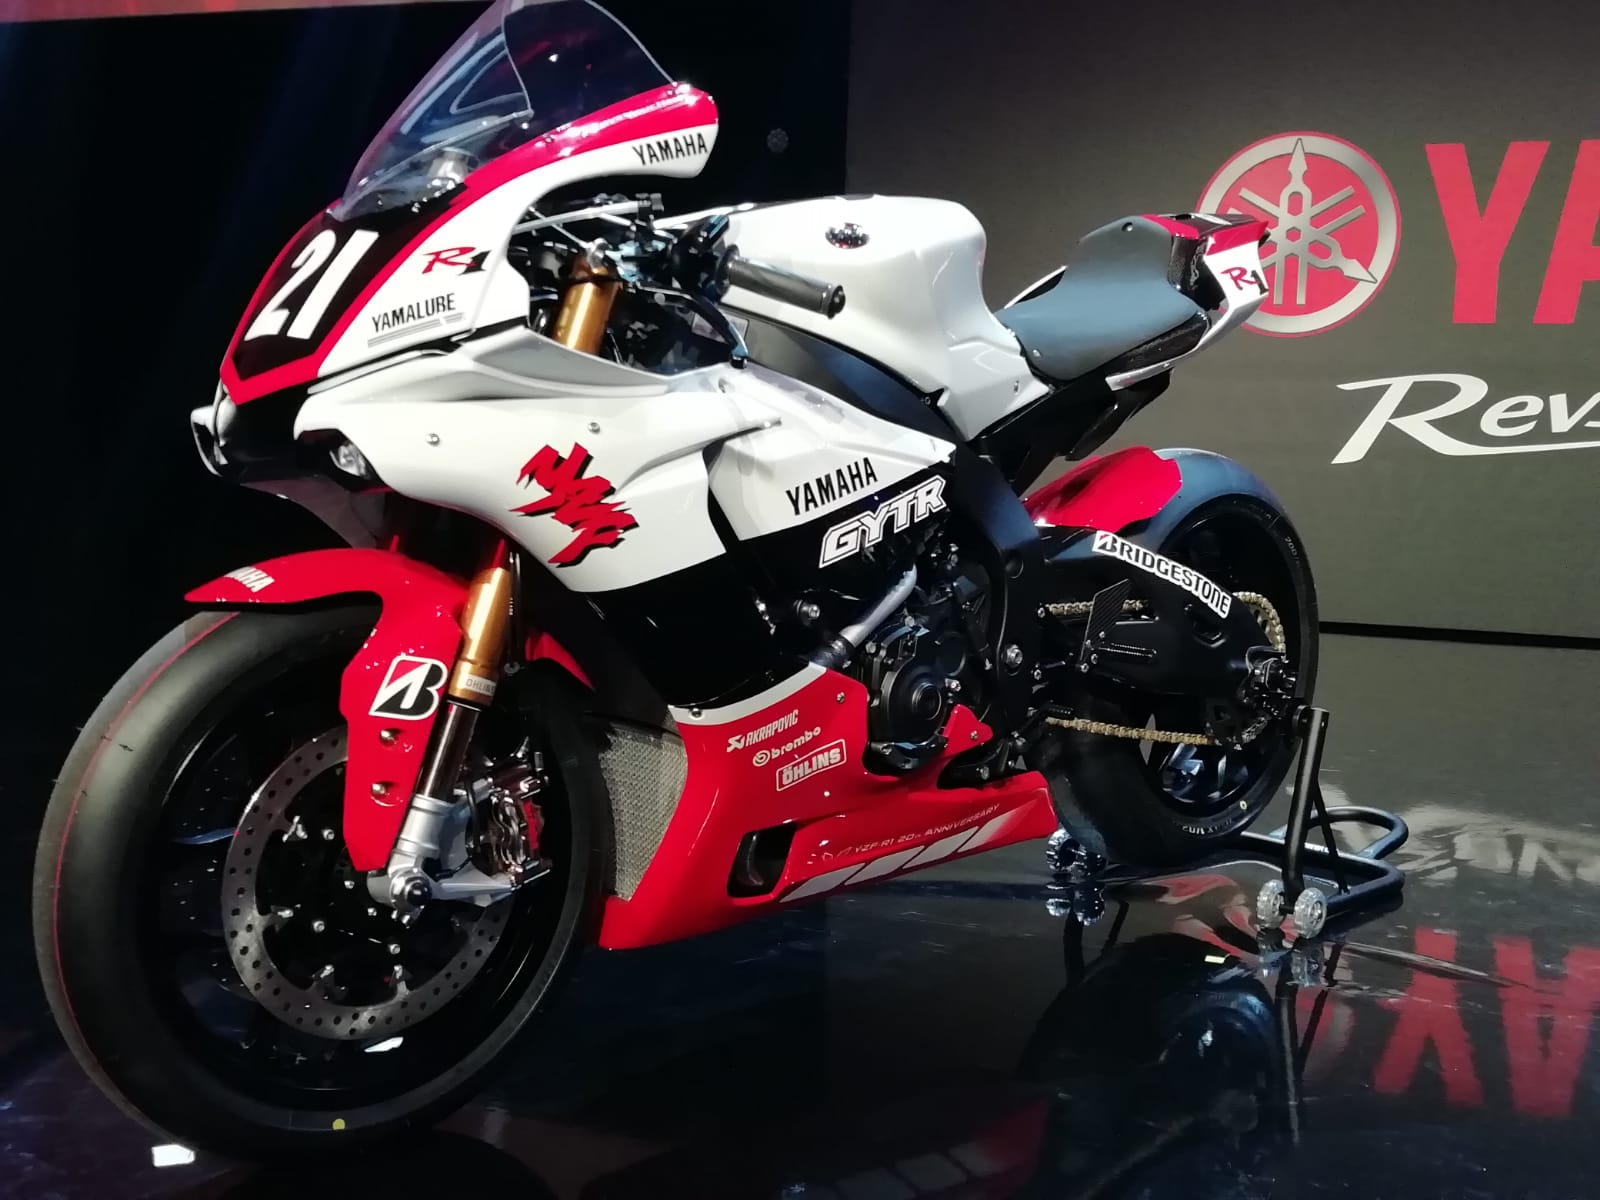 Eicma Milao Yamaha Apresenta A Nova Desportiva R1 Gytr 2019